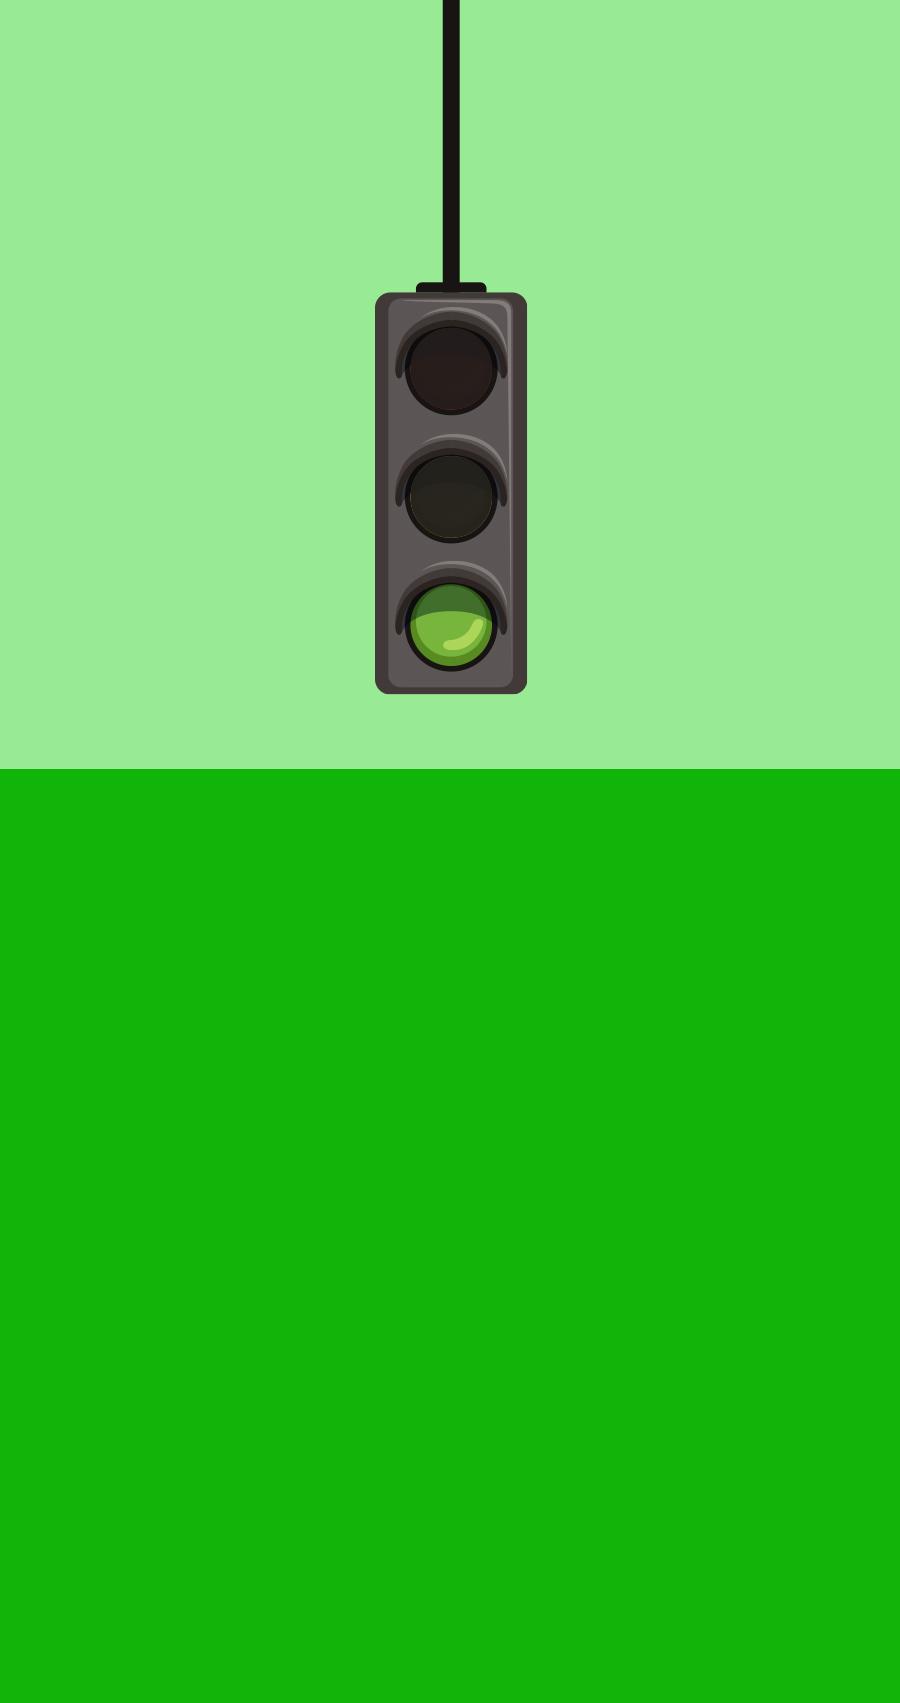 ampel-gruen-mobil